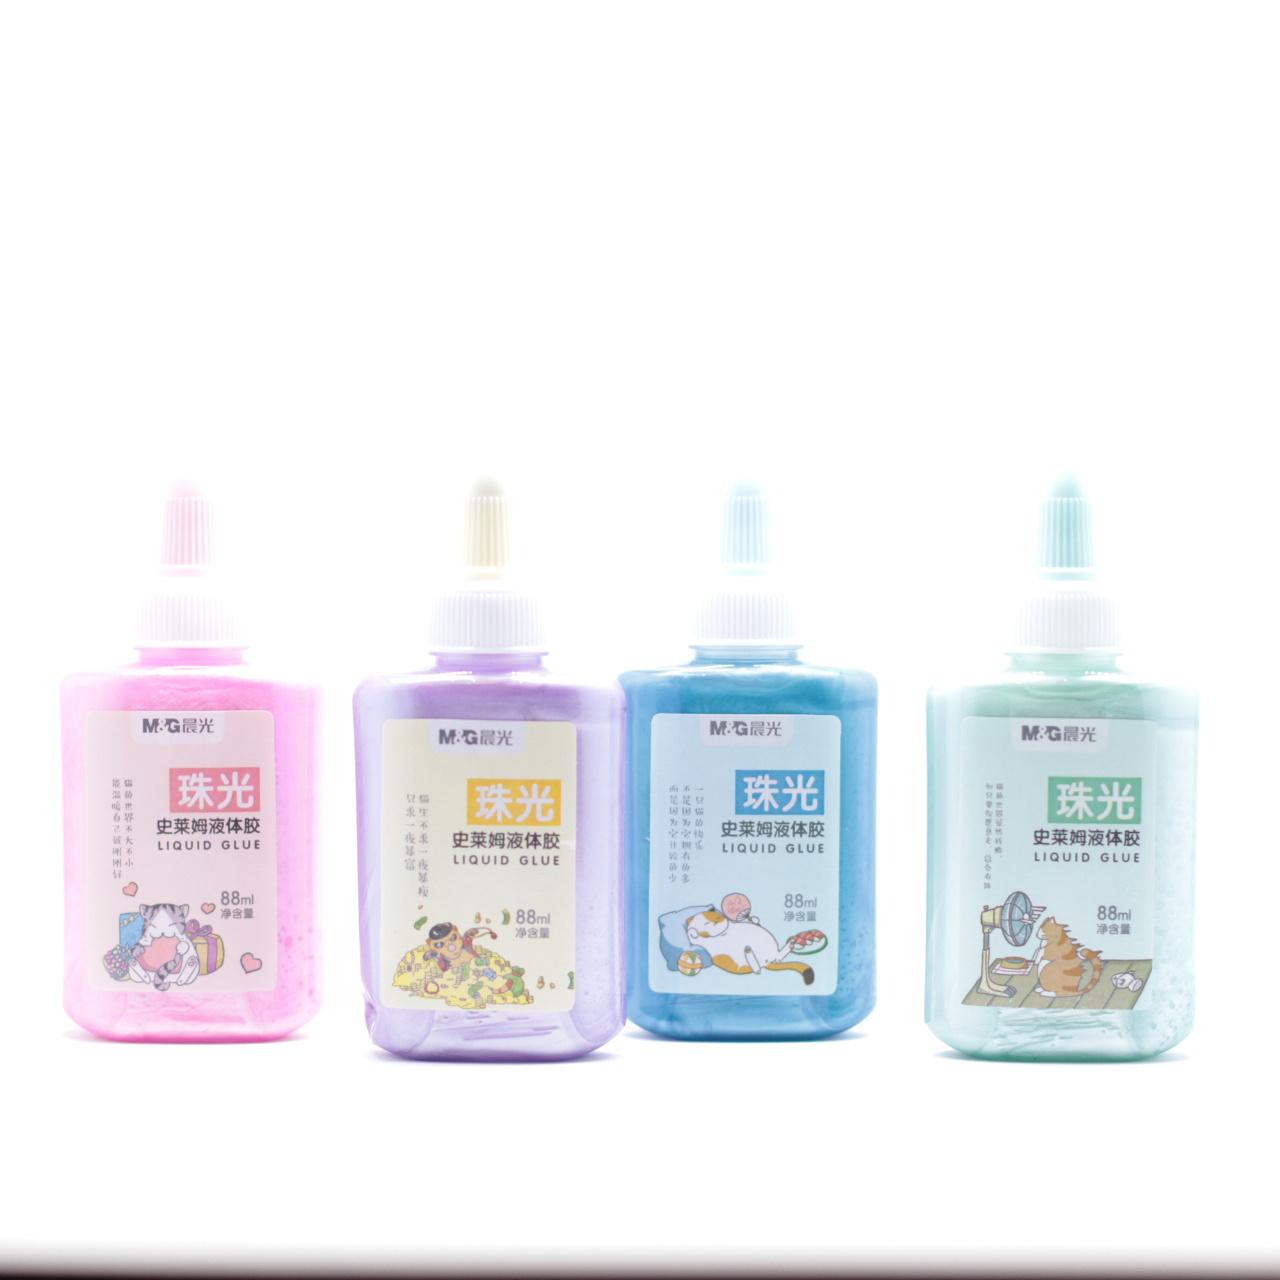 AWG97062 88ml Liquid Glue